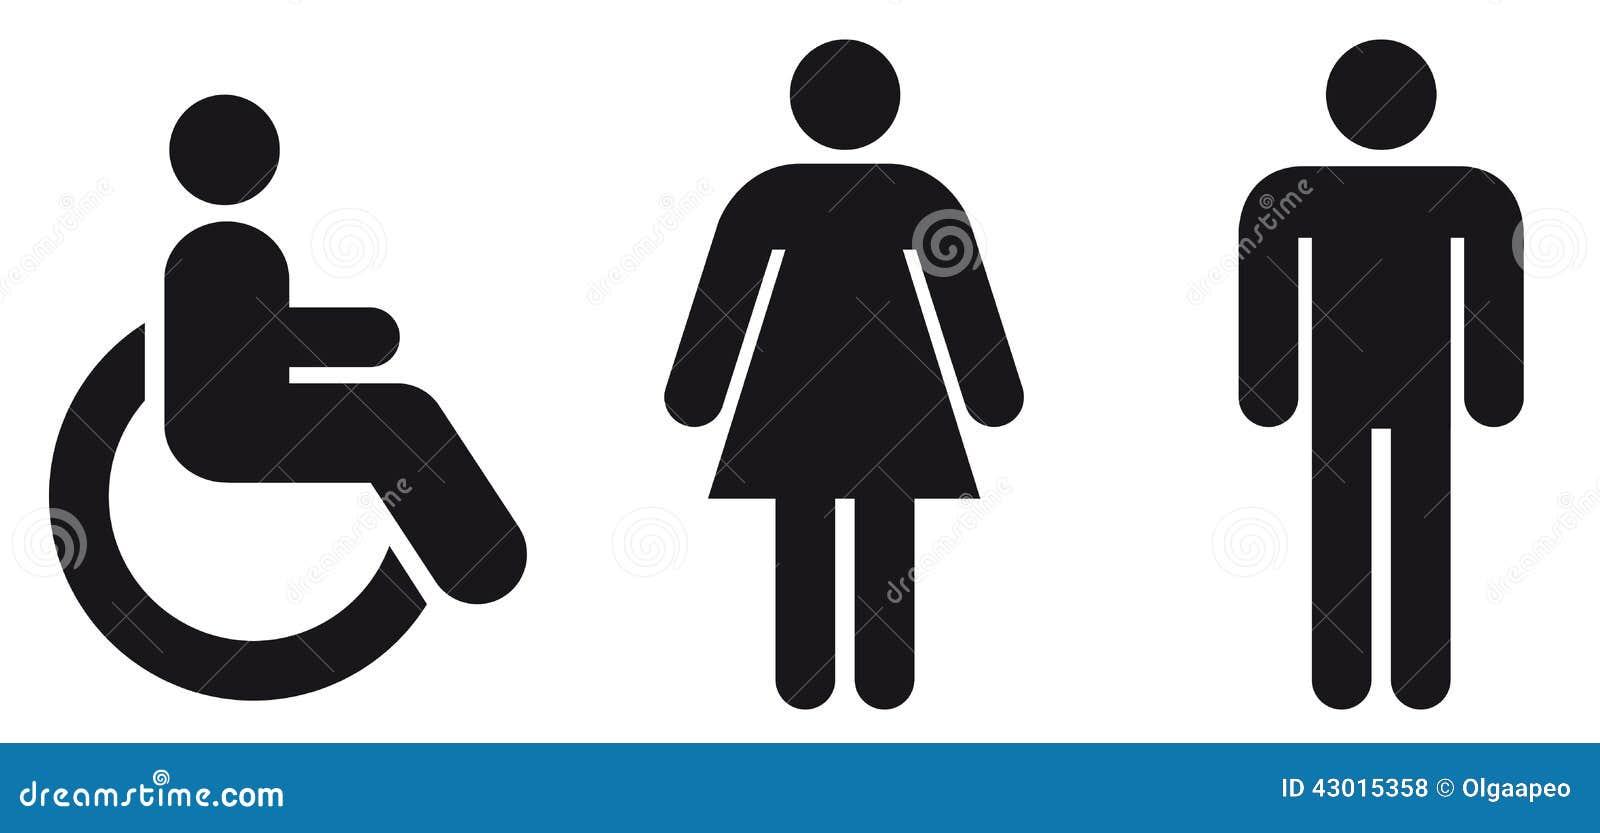 SymbolWC Vektor Abbildung  Bild 43015358 -> Banheiro Feminino Vetor Free